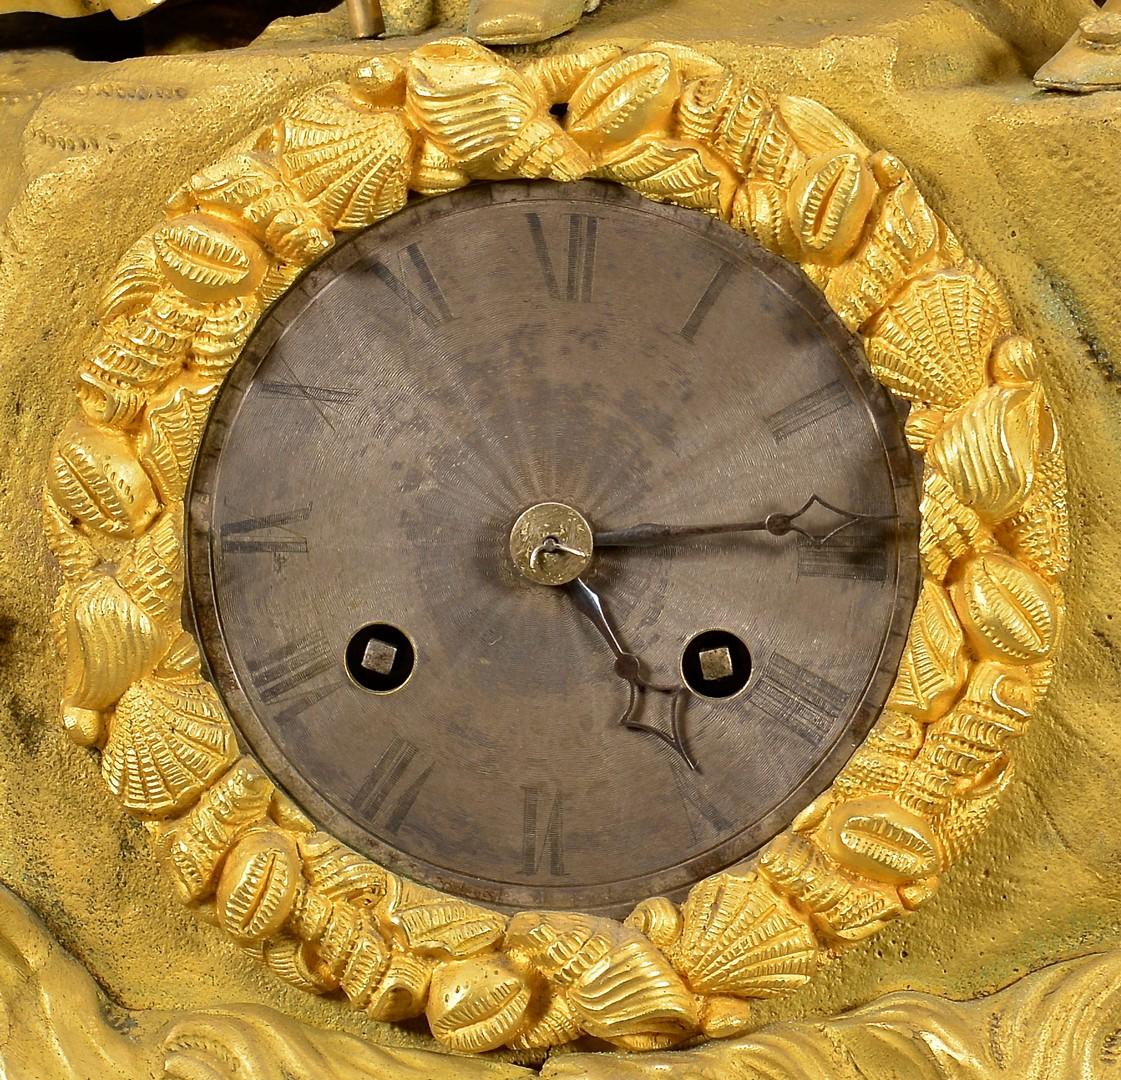 Lot 626: French Gilt Bronze Figural Clock, Legrand